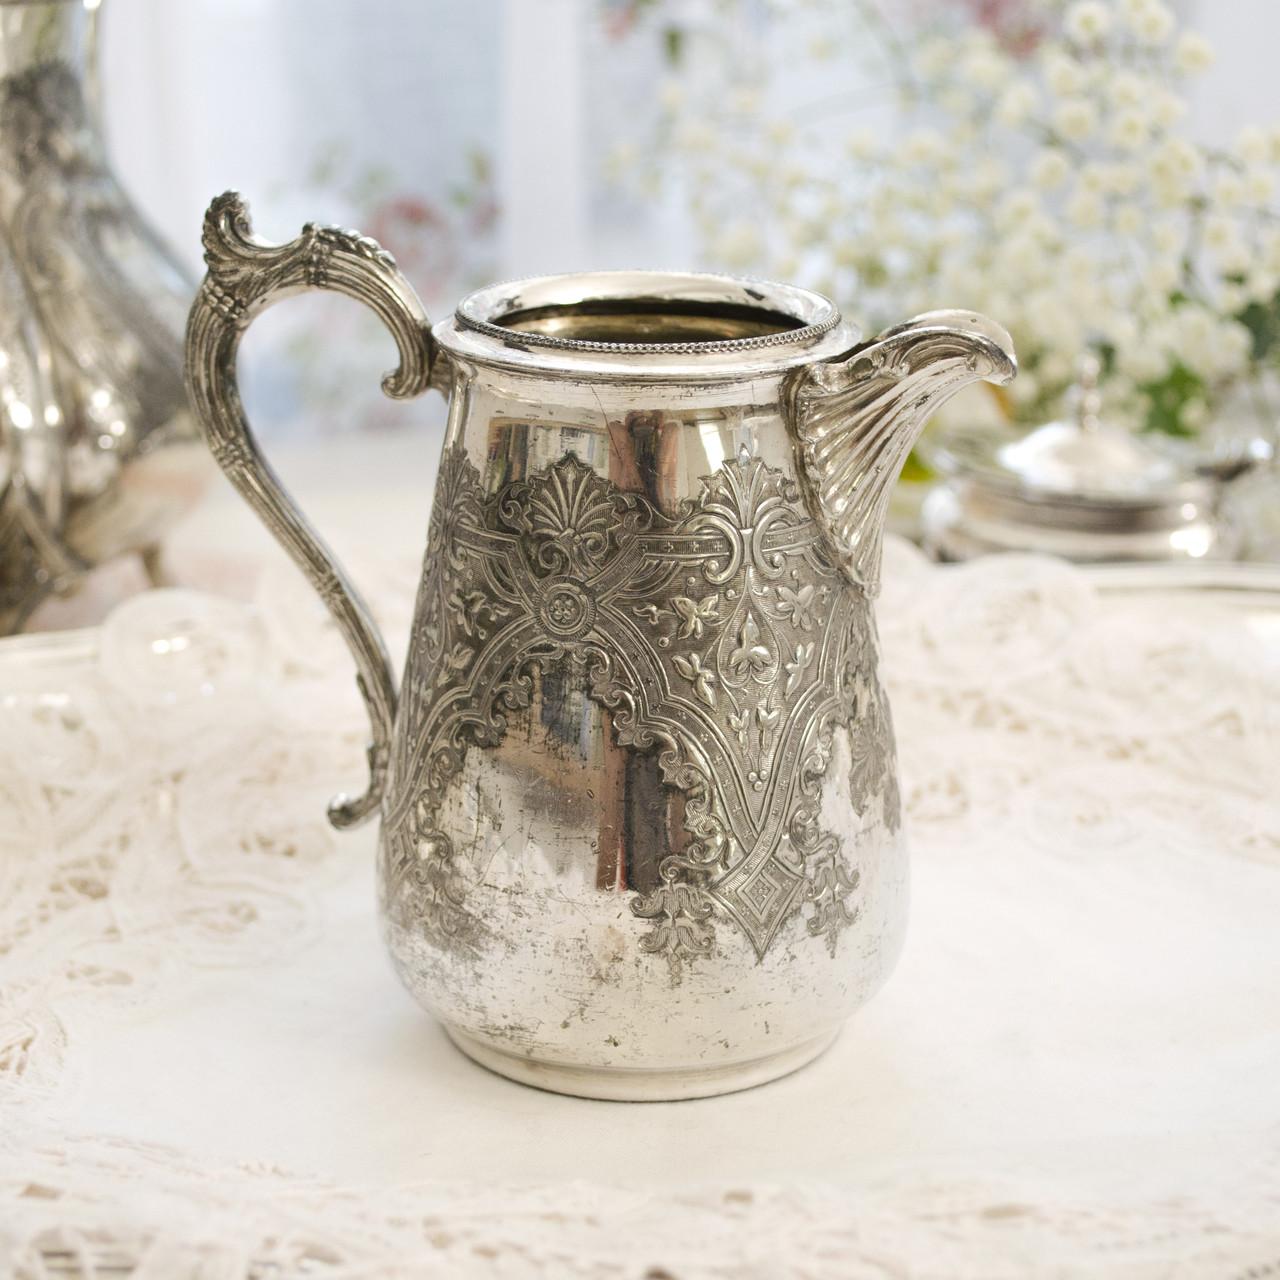 Старый посеребренный молочник, кувшинчик, серебрение, мельхиор, Англия, Walker & Hall  Sheffield